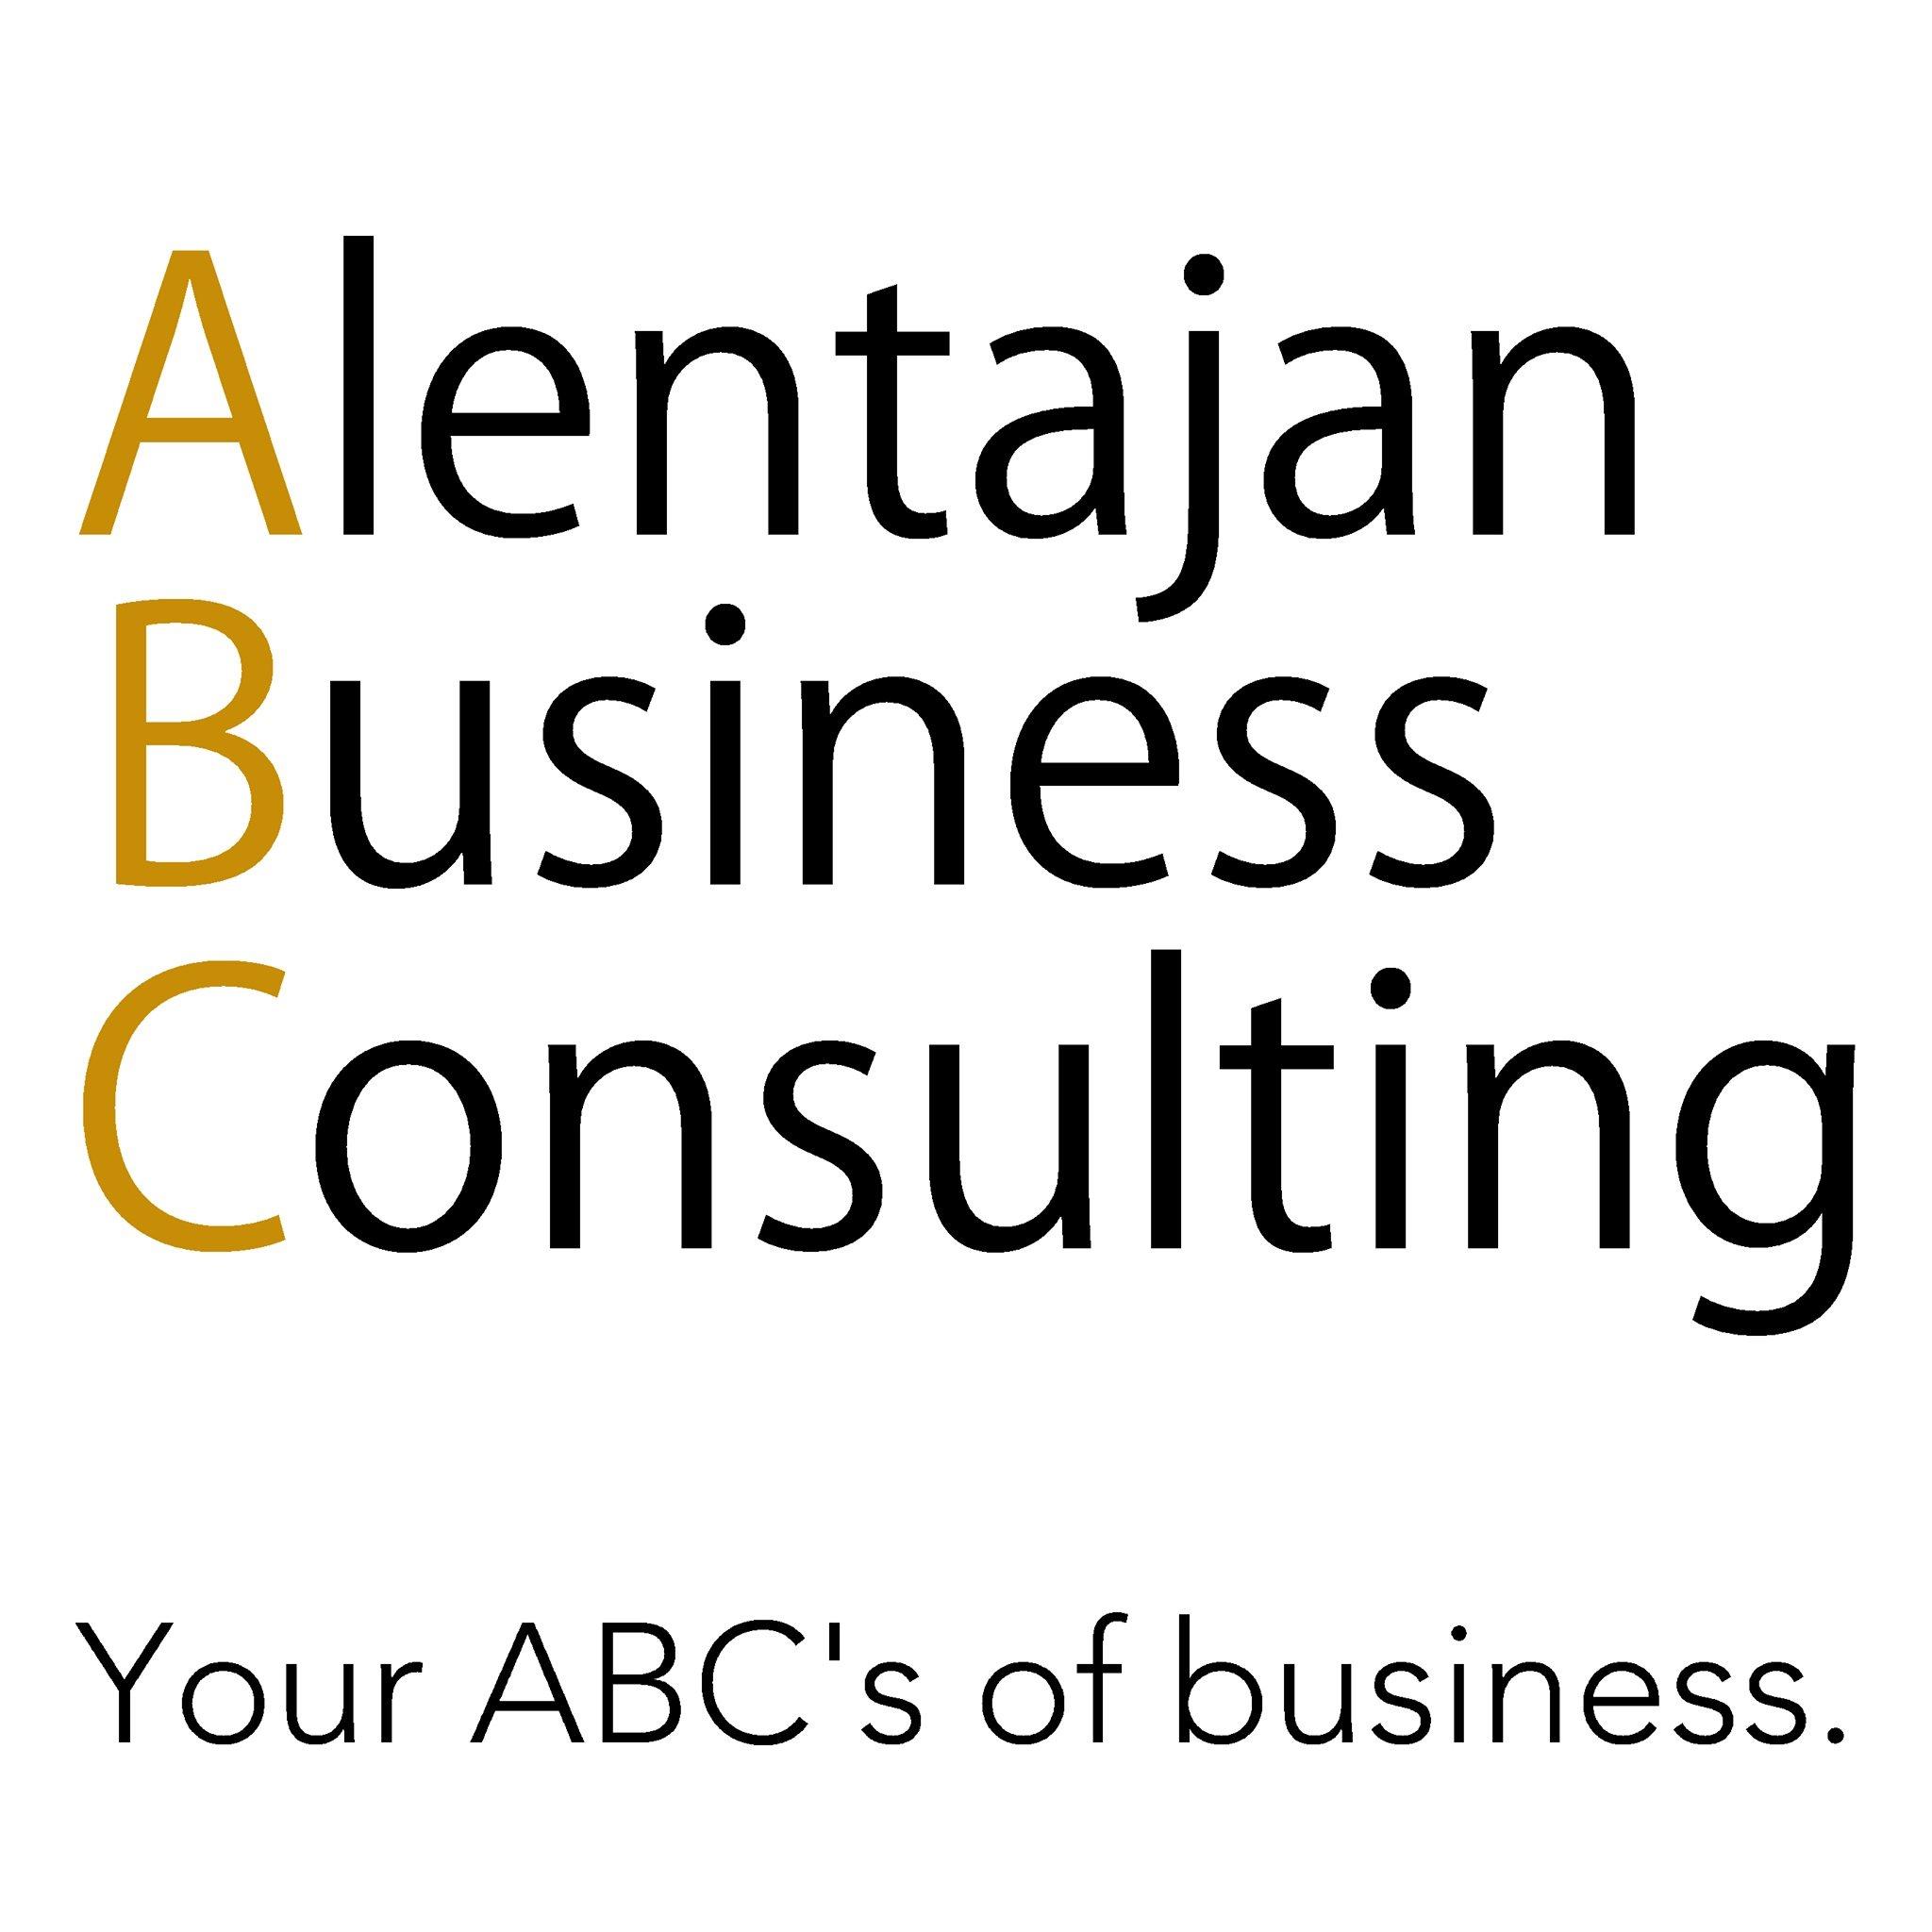 Alentajan Business Consulting